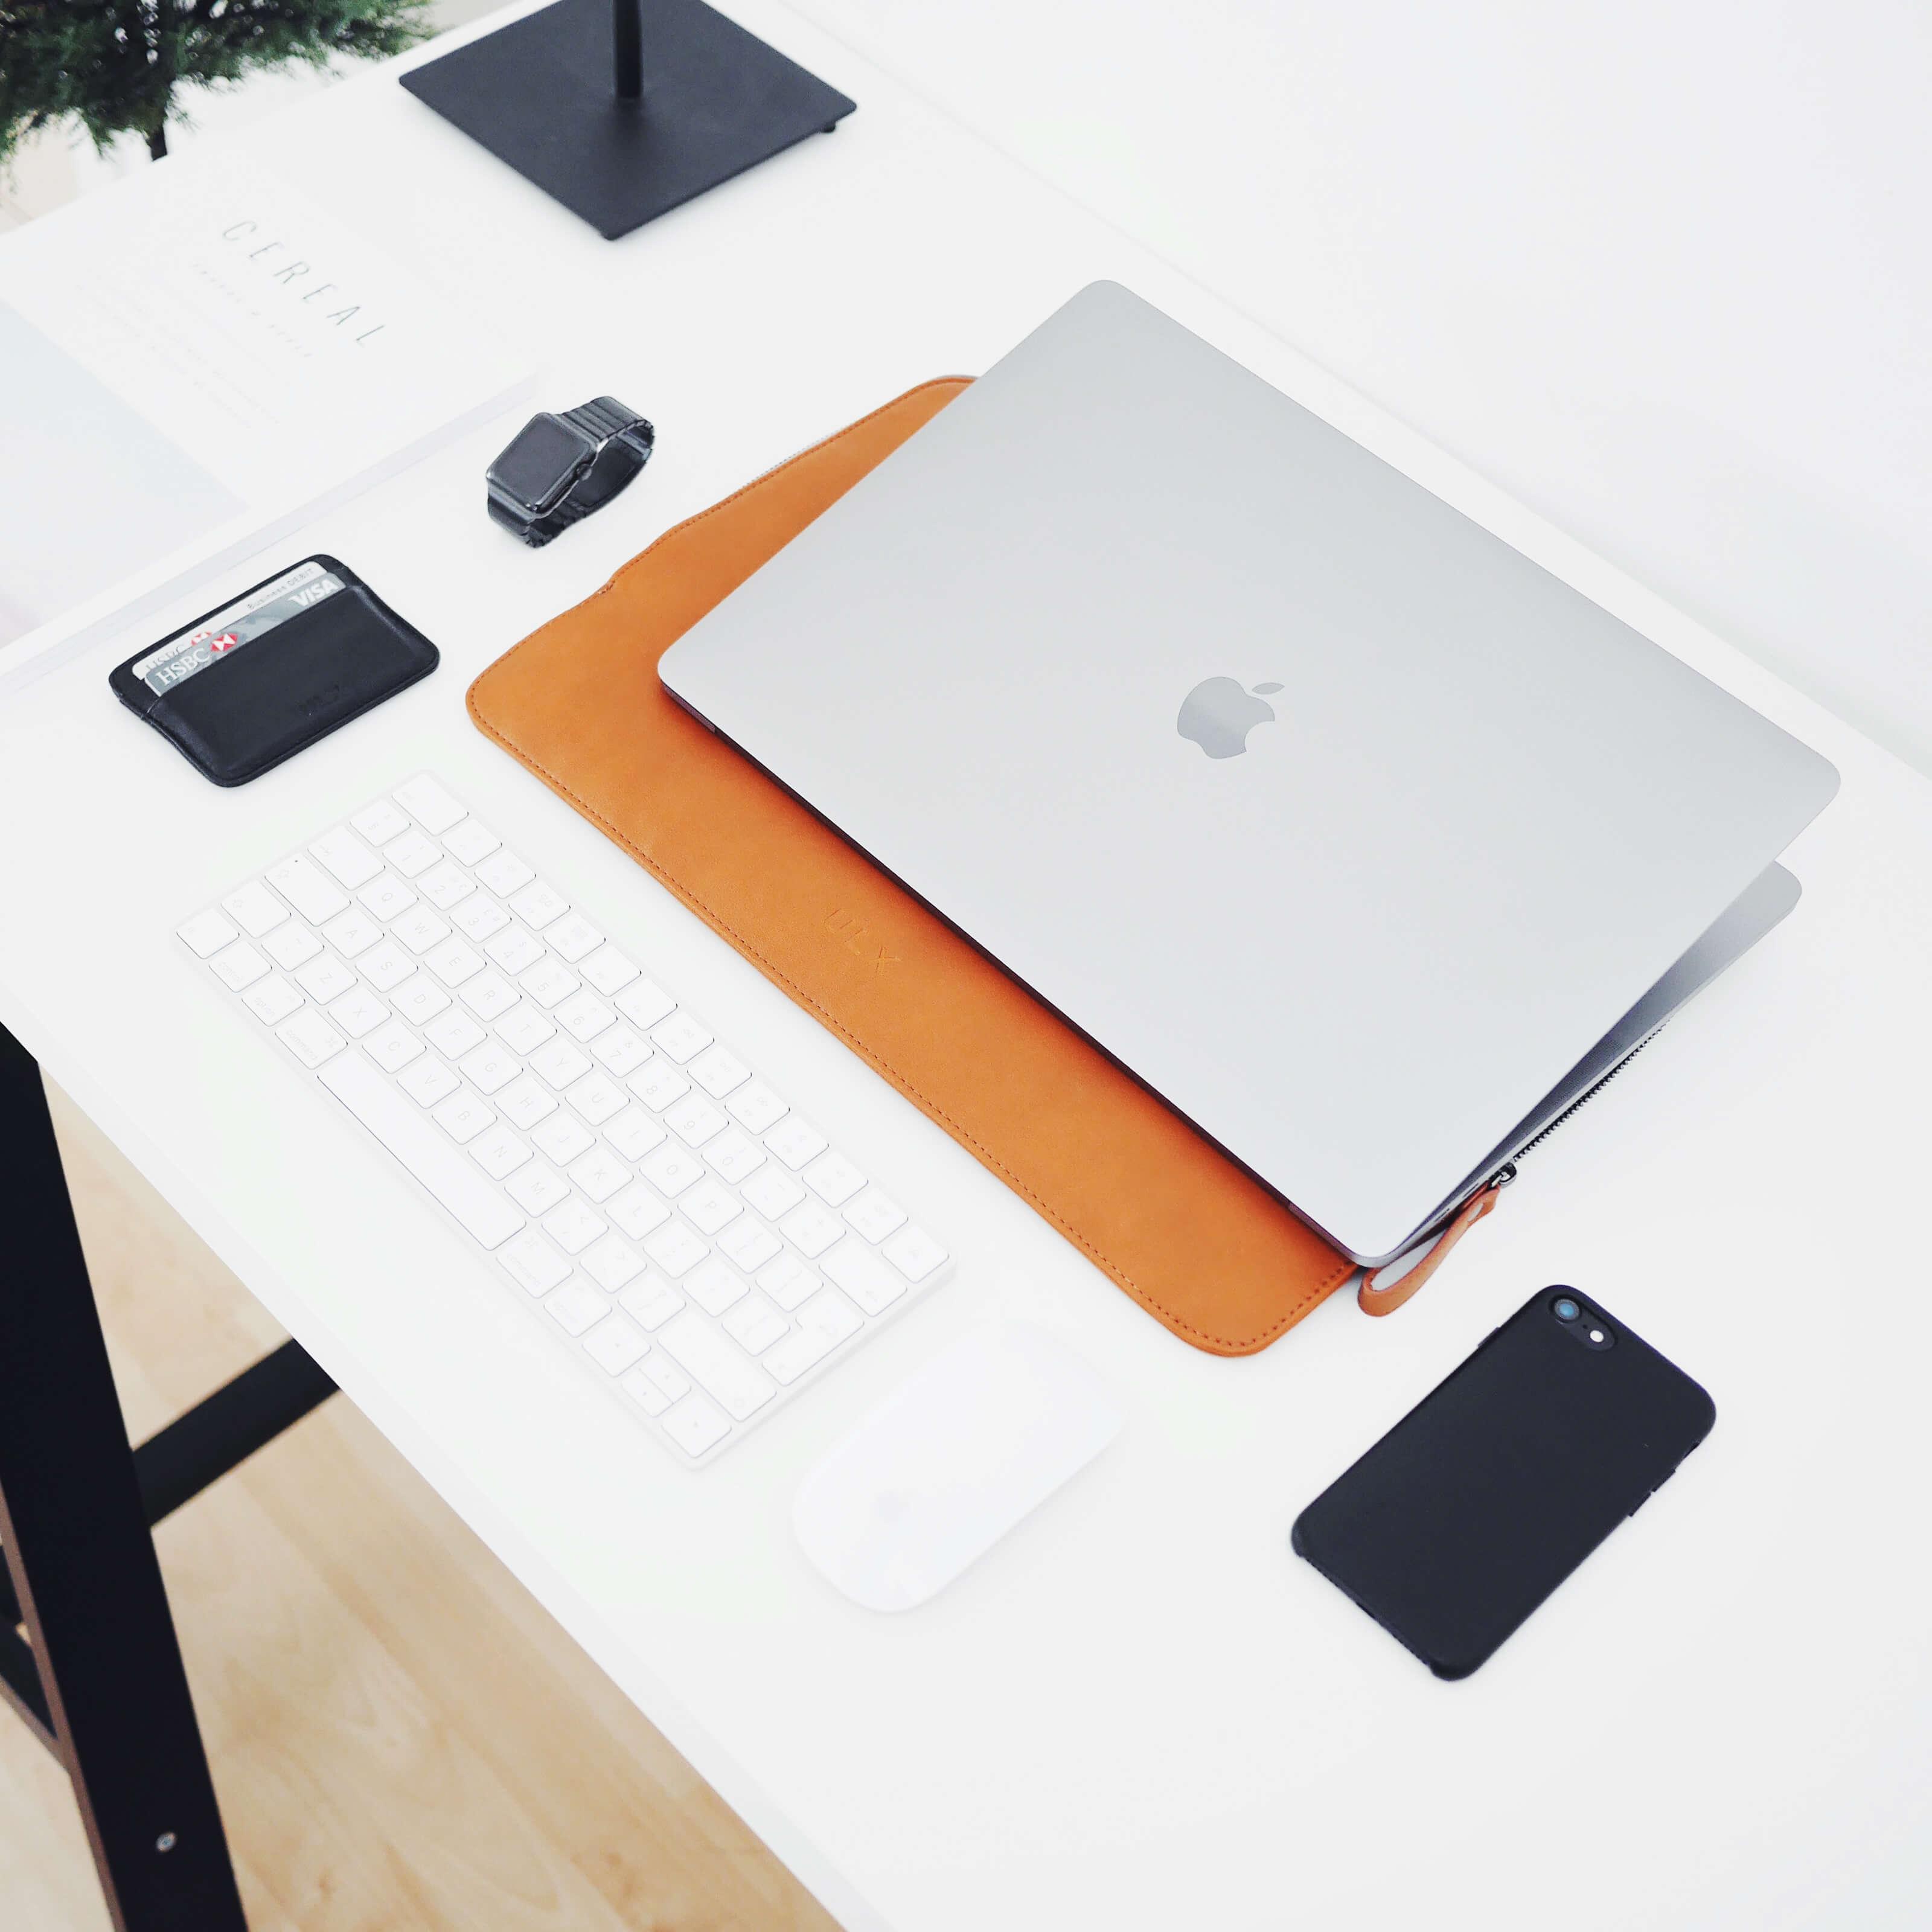 macbook ,standing desk, phone ,office supplies